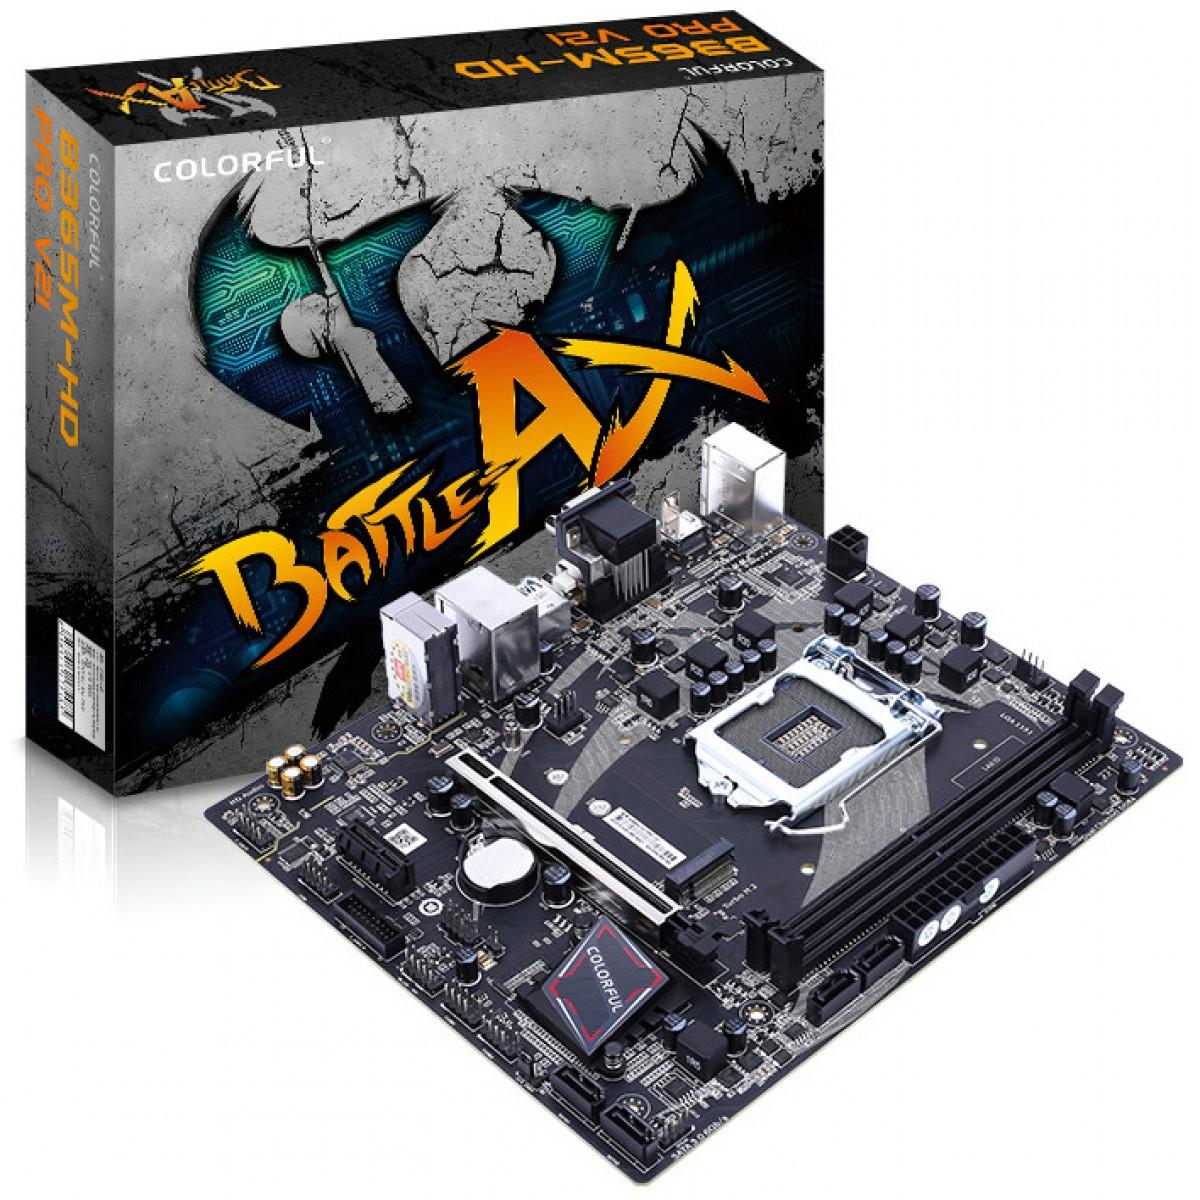 Placa Mãe Colorful BATTLE-AX B365M-HD PRO V21, Chipset B365, Intel LGA 1151, mAXT, DDR4, 110001204311